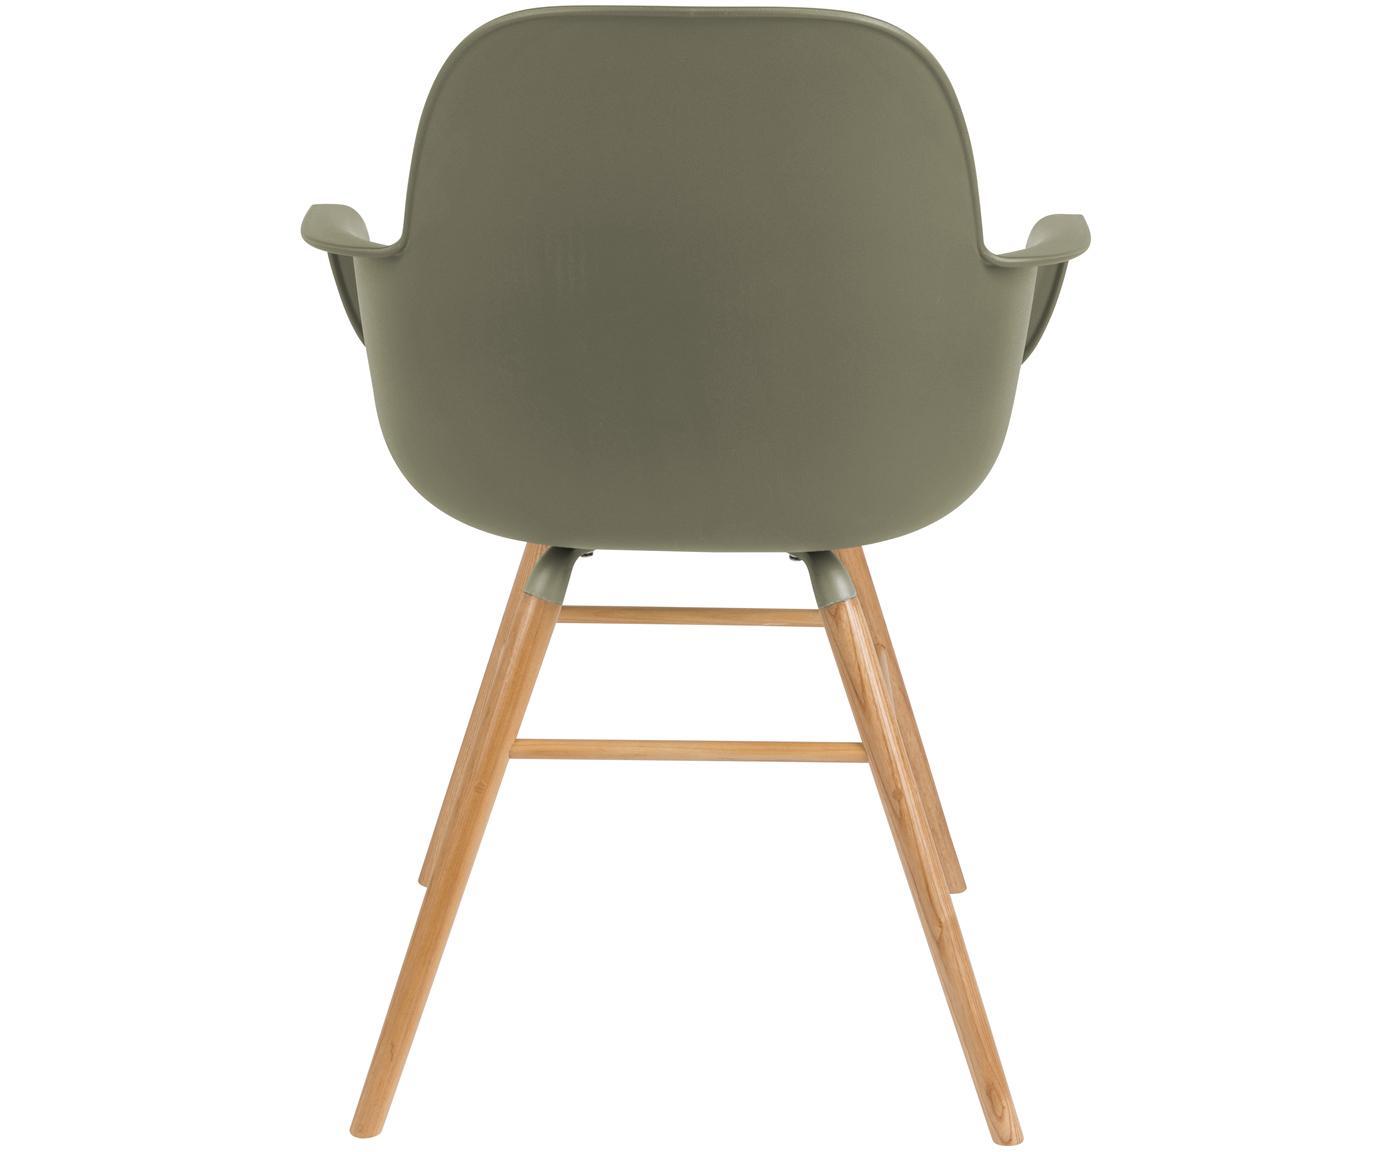 Armlehnstuhl Albert Kuip mit Holzbeinen, Sitzfläche: Polypropylen, Beine: Eschenholz, Grün, B 59 x T 55 cm